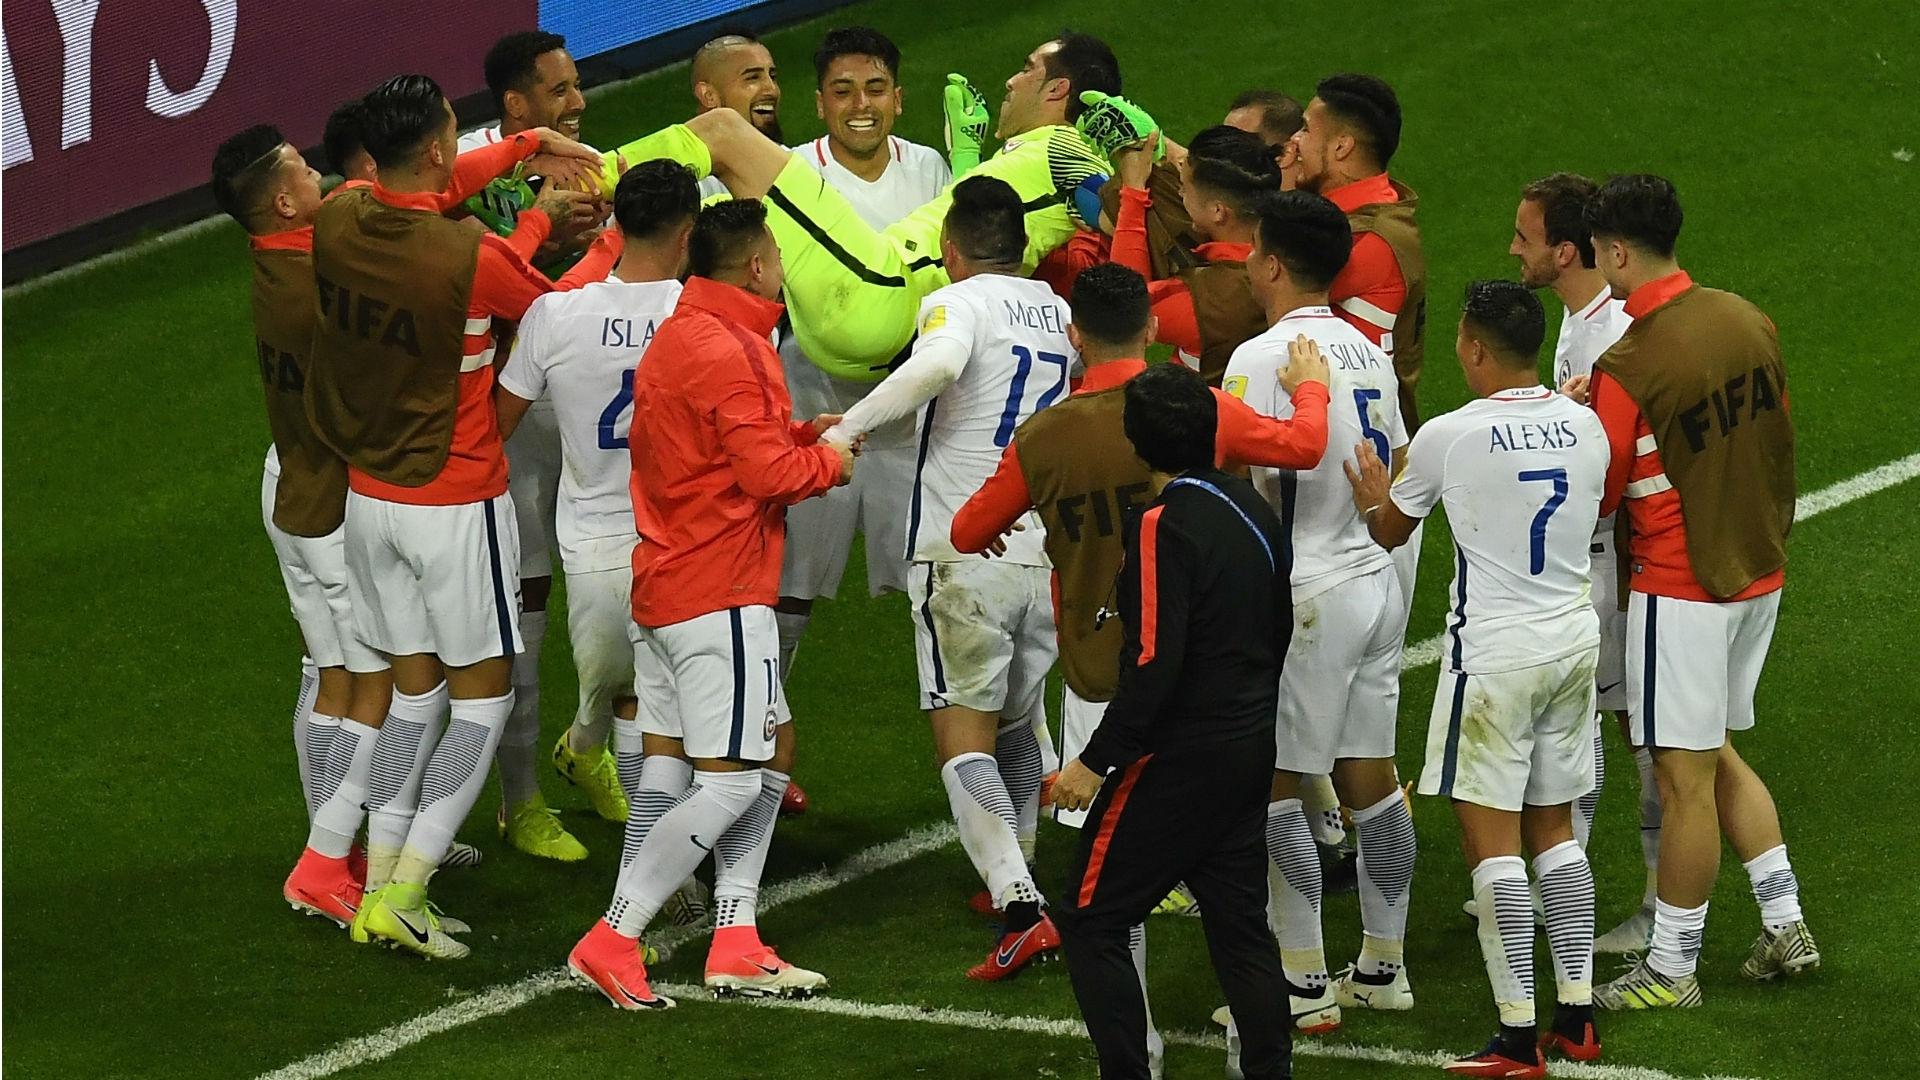 Claudio Bravo managed to save the first two penalty kicks struck byRicardo Quaresma and Joao Moutinho.